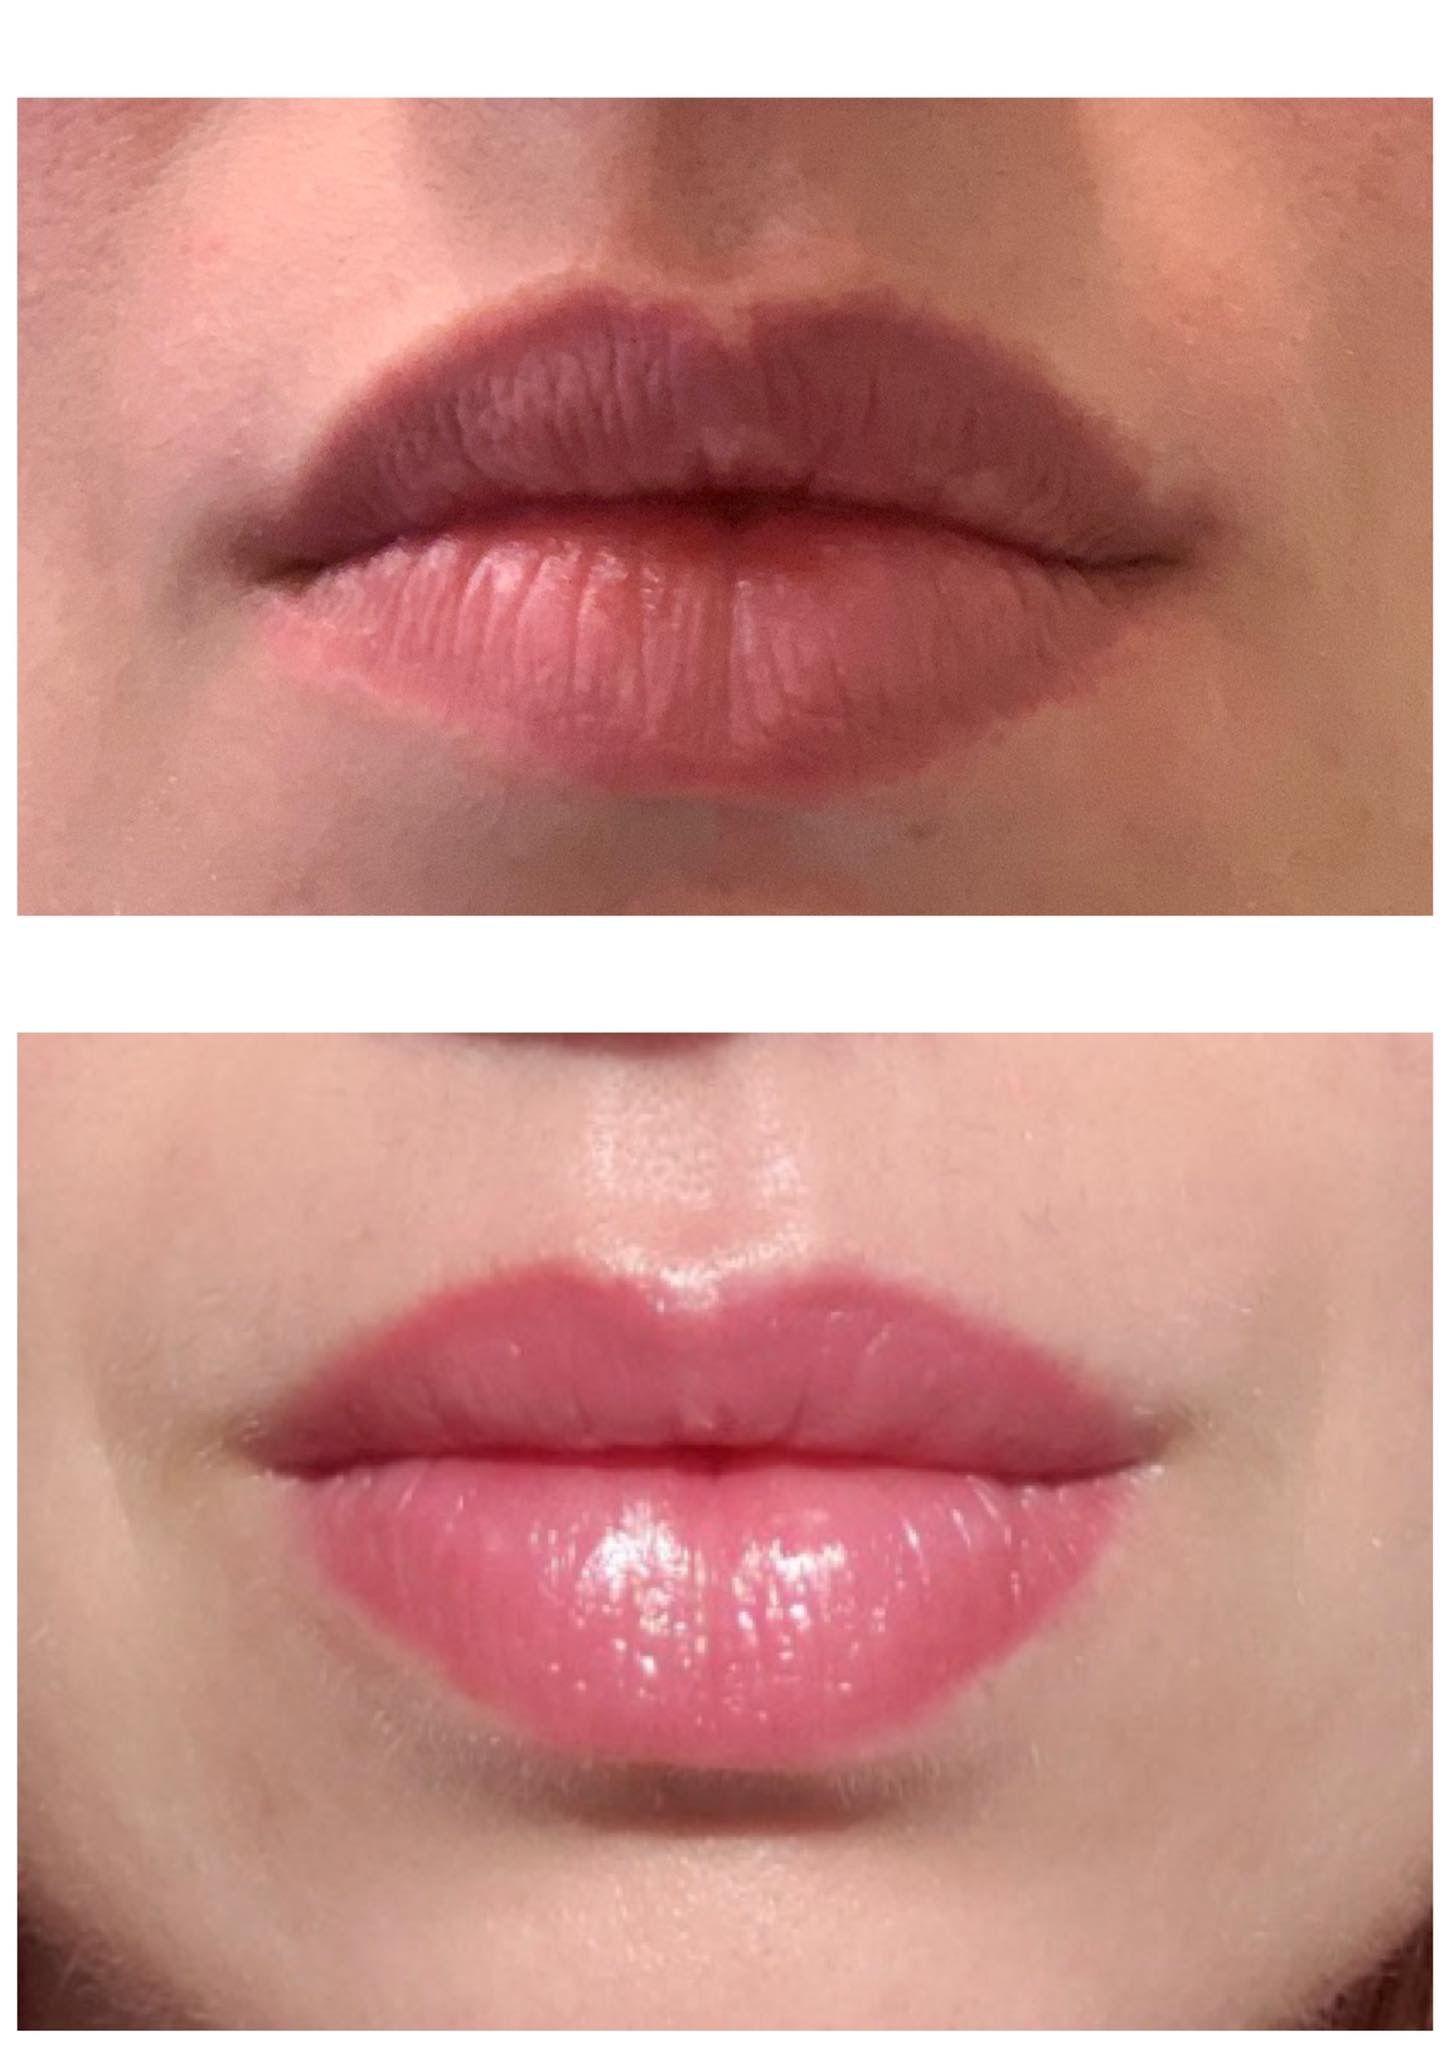 Healed full lip blush permanent cosmetics permanent